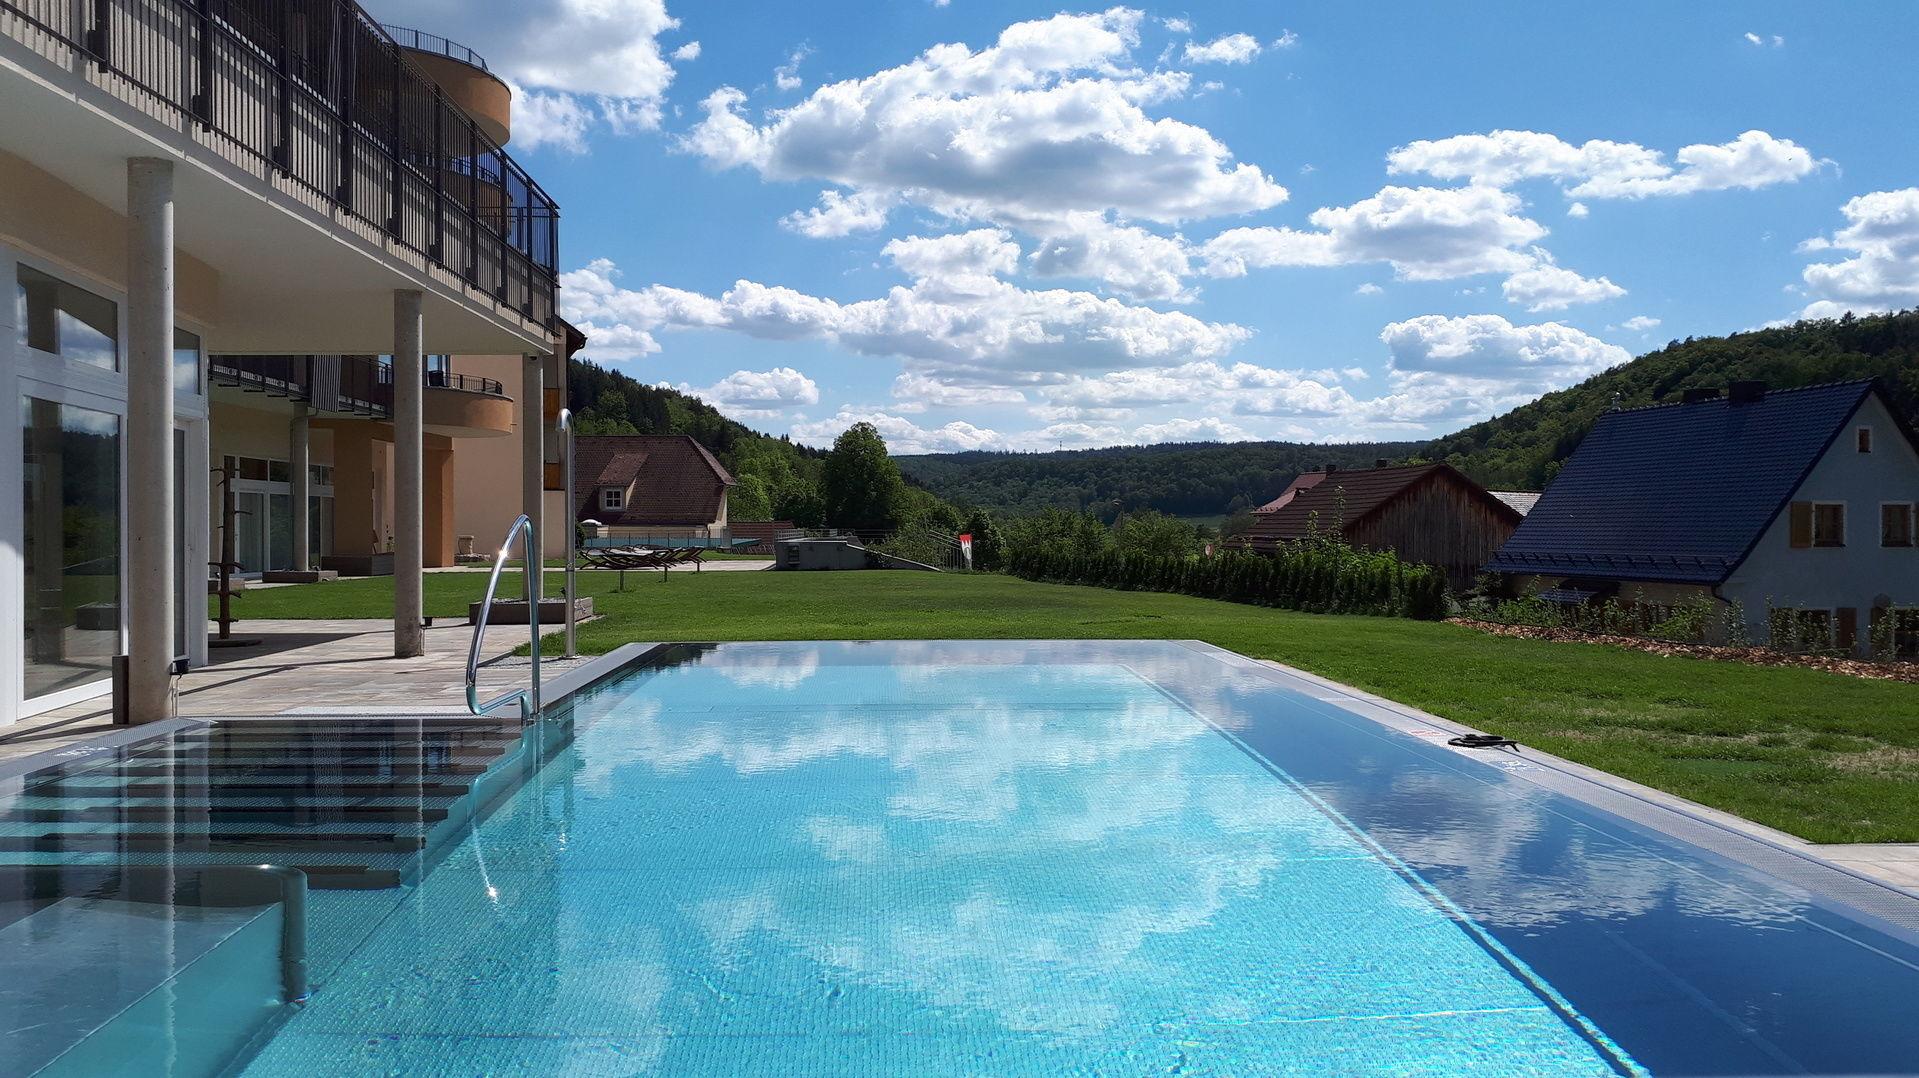 single wellness hotel schweiz kennenlernen bulgarisch